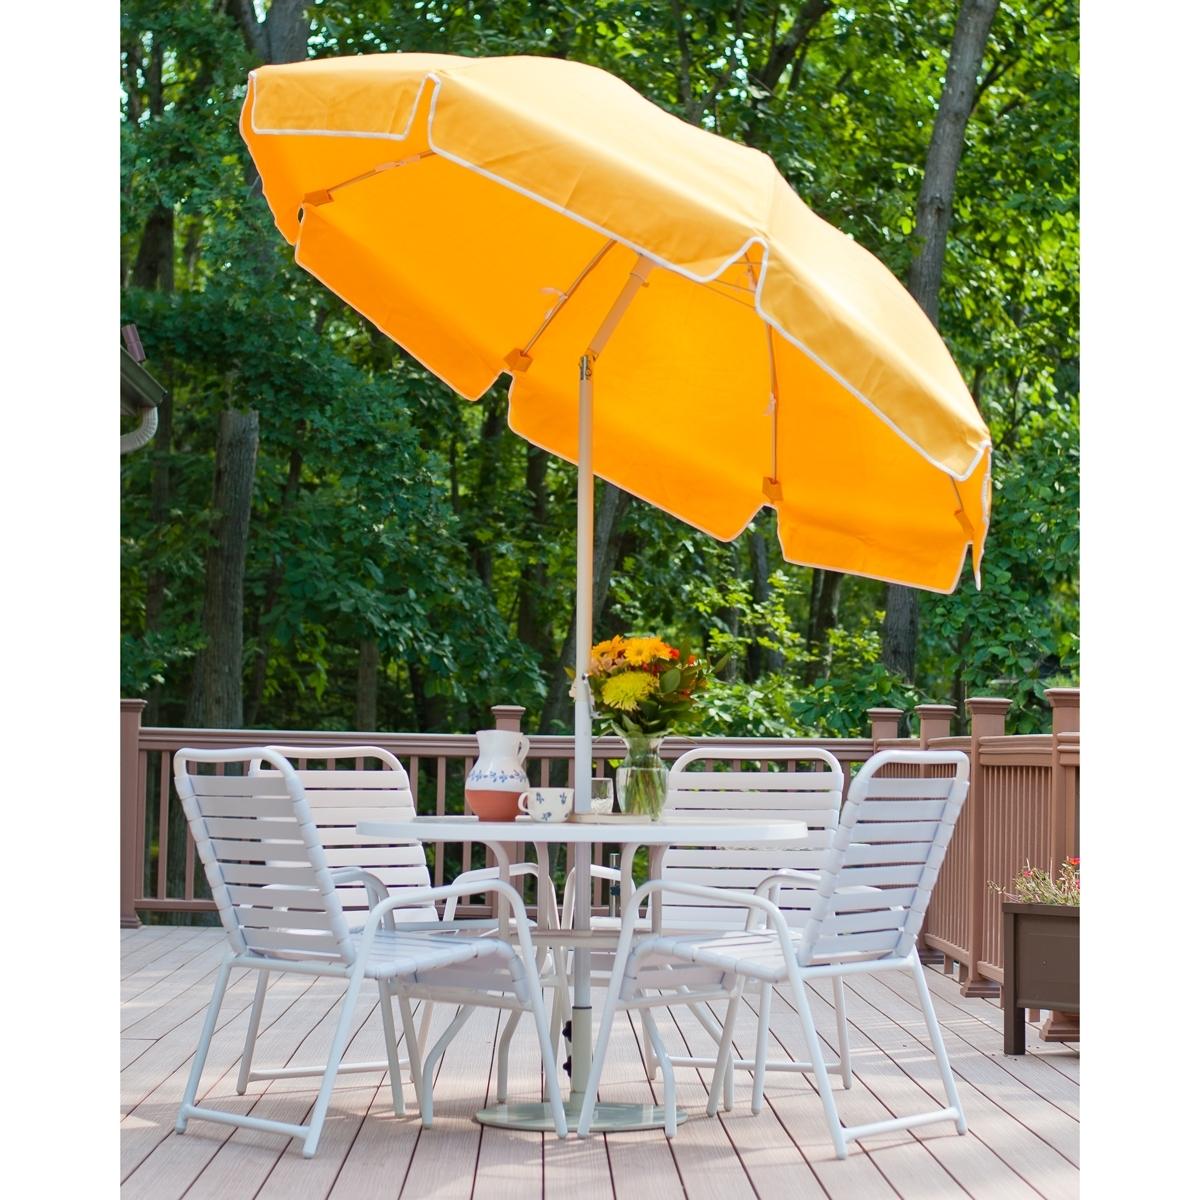 Yellow Patio Umbrellas Regarding Well Liked 7.5 Ft Frankford Acrylic Fiberglass Patio Umbrella With Valance (Gallery 14 of 20)